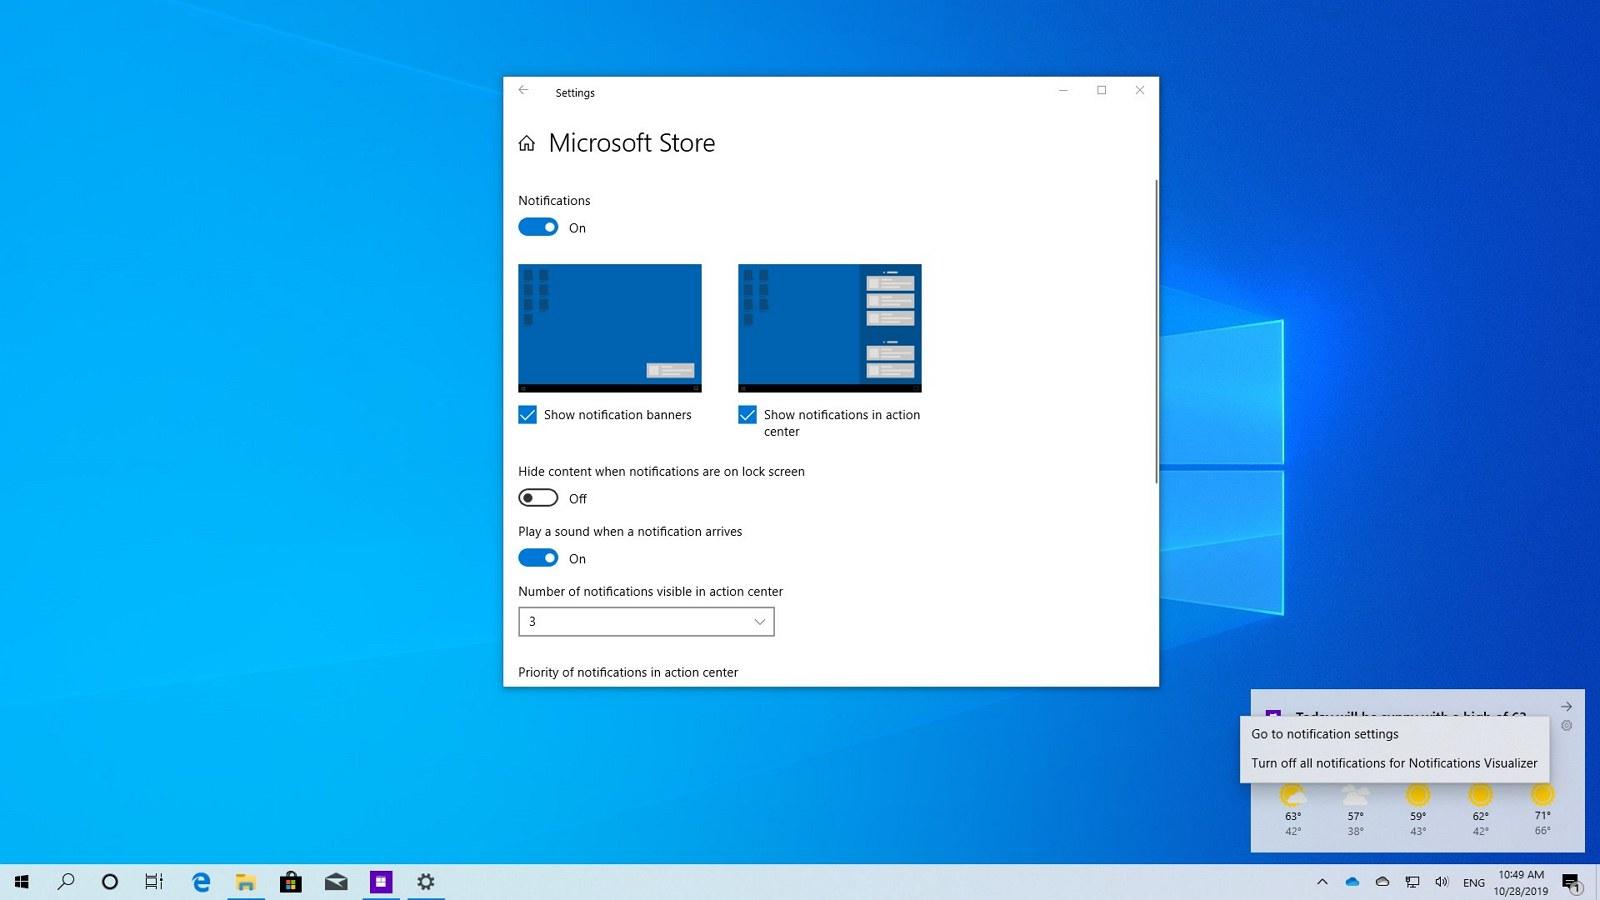 Windows 10 version 1909, November 2019 Update, review